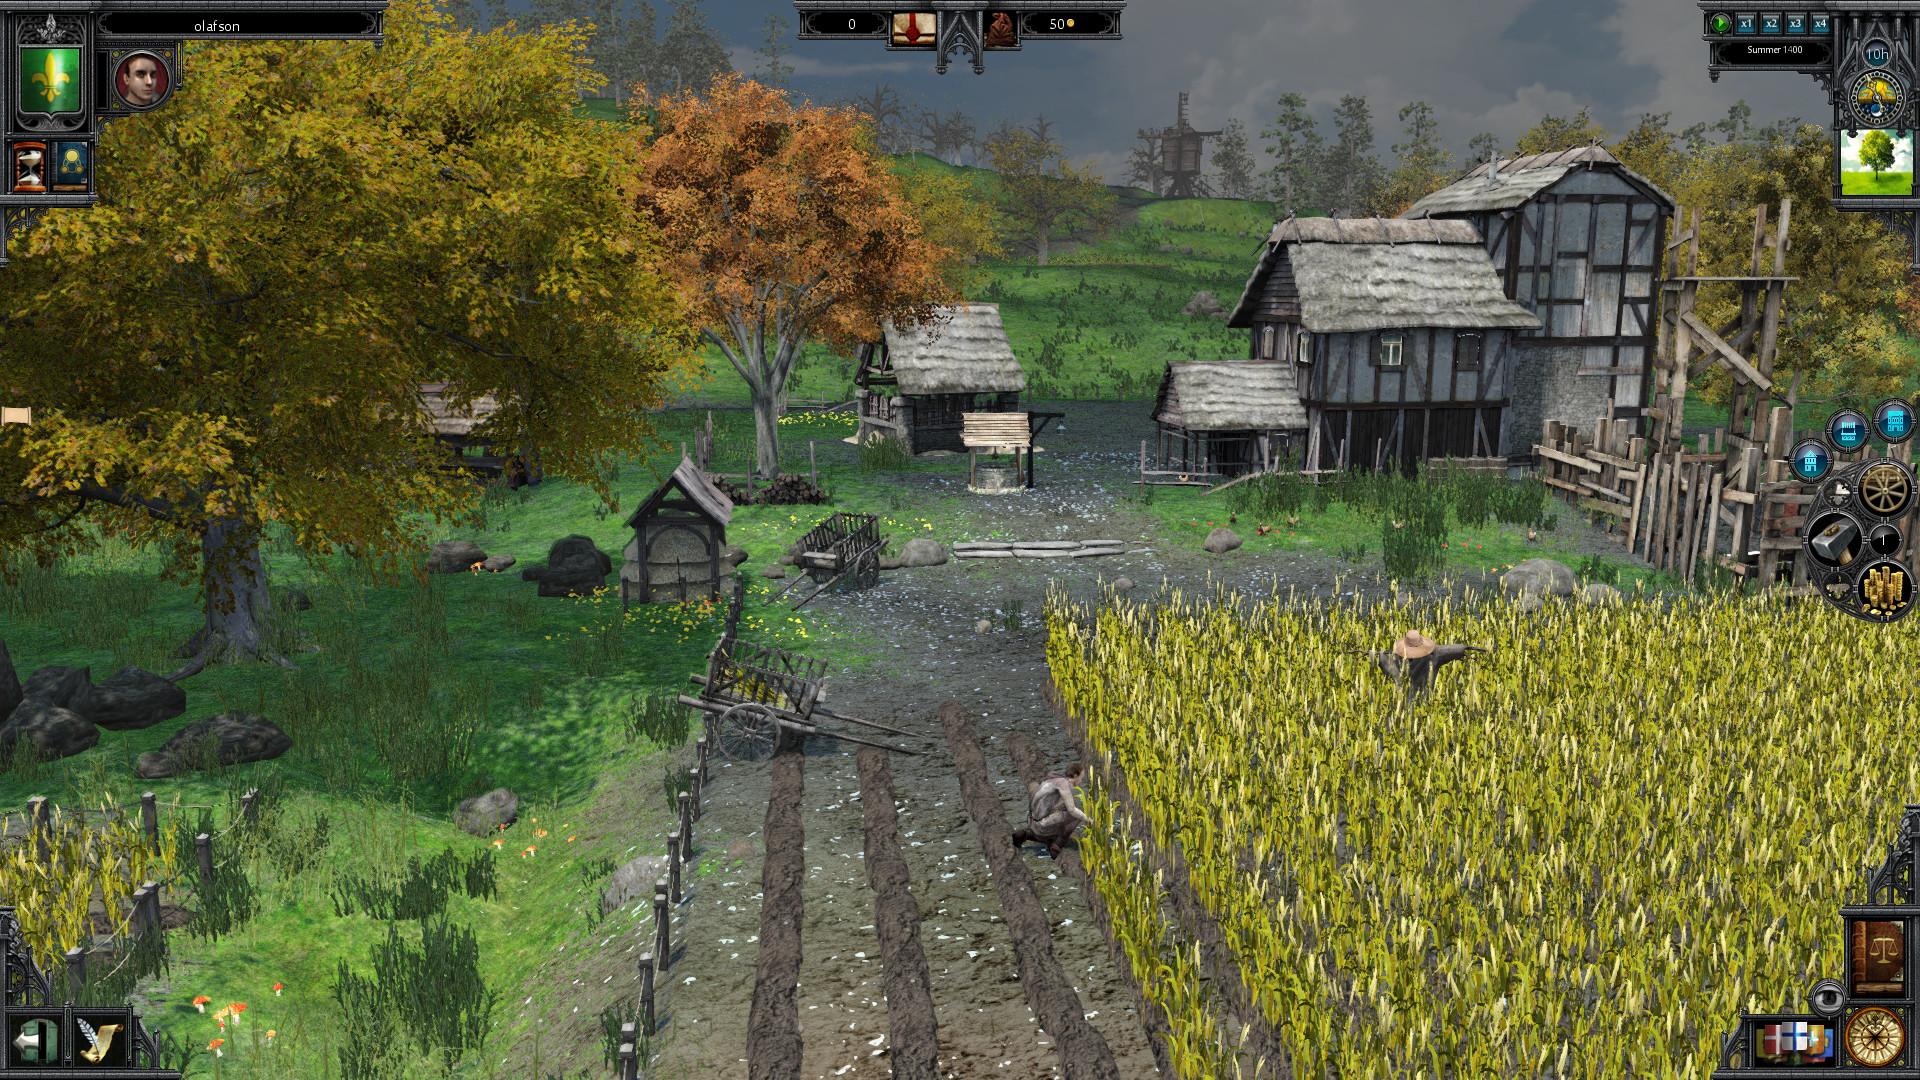 Die Gilde 3 - Early Access - Feld und Mühle